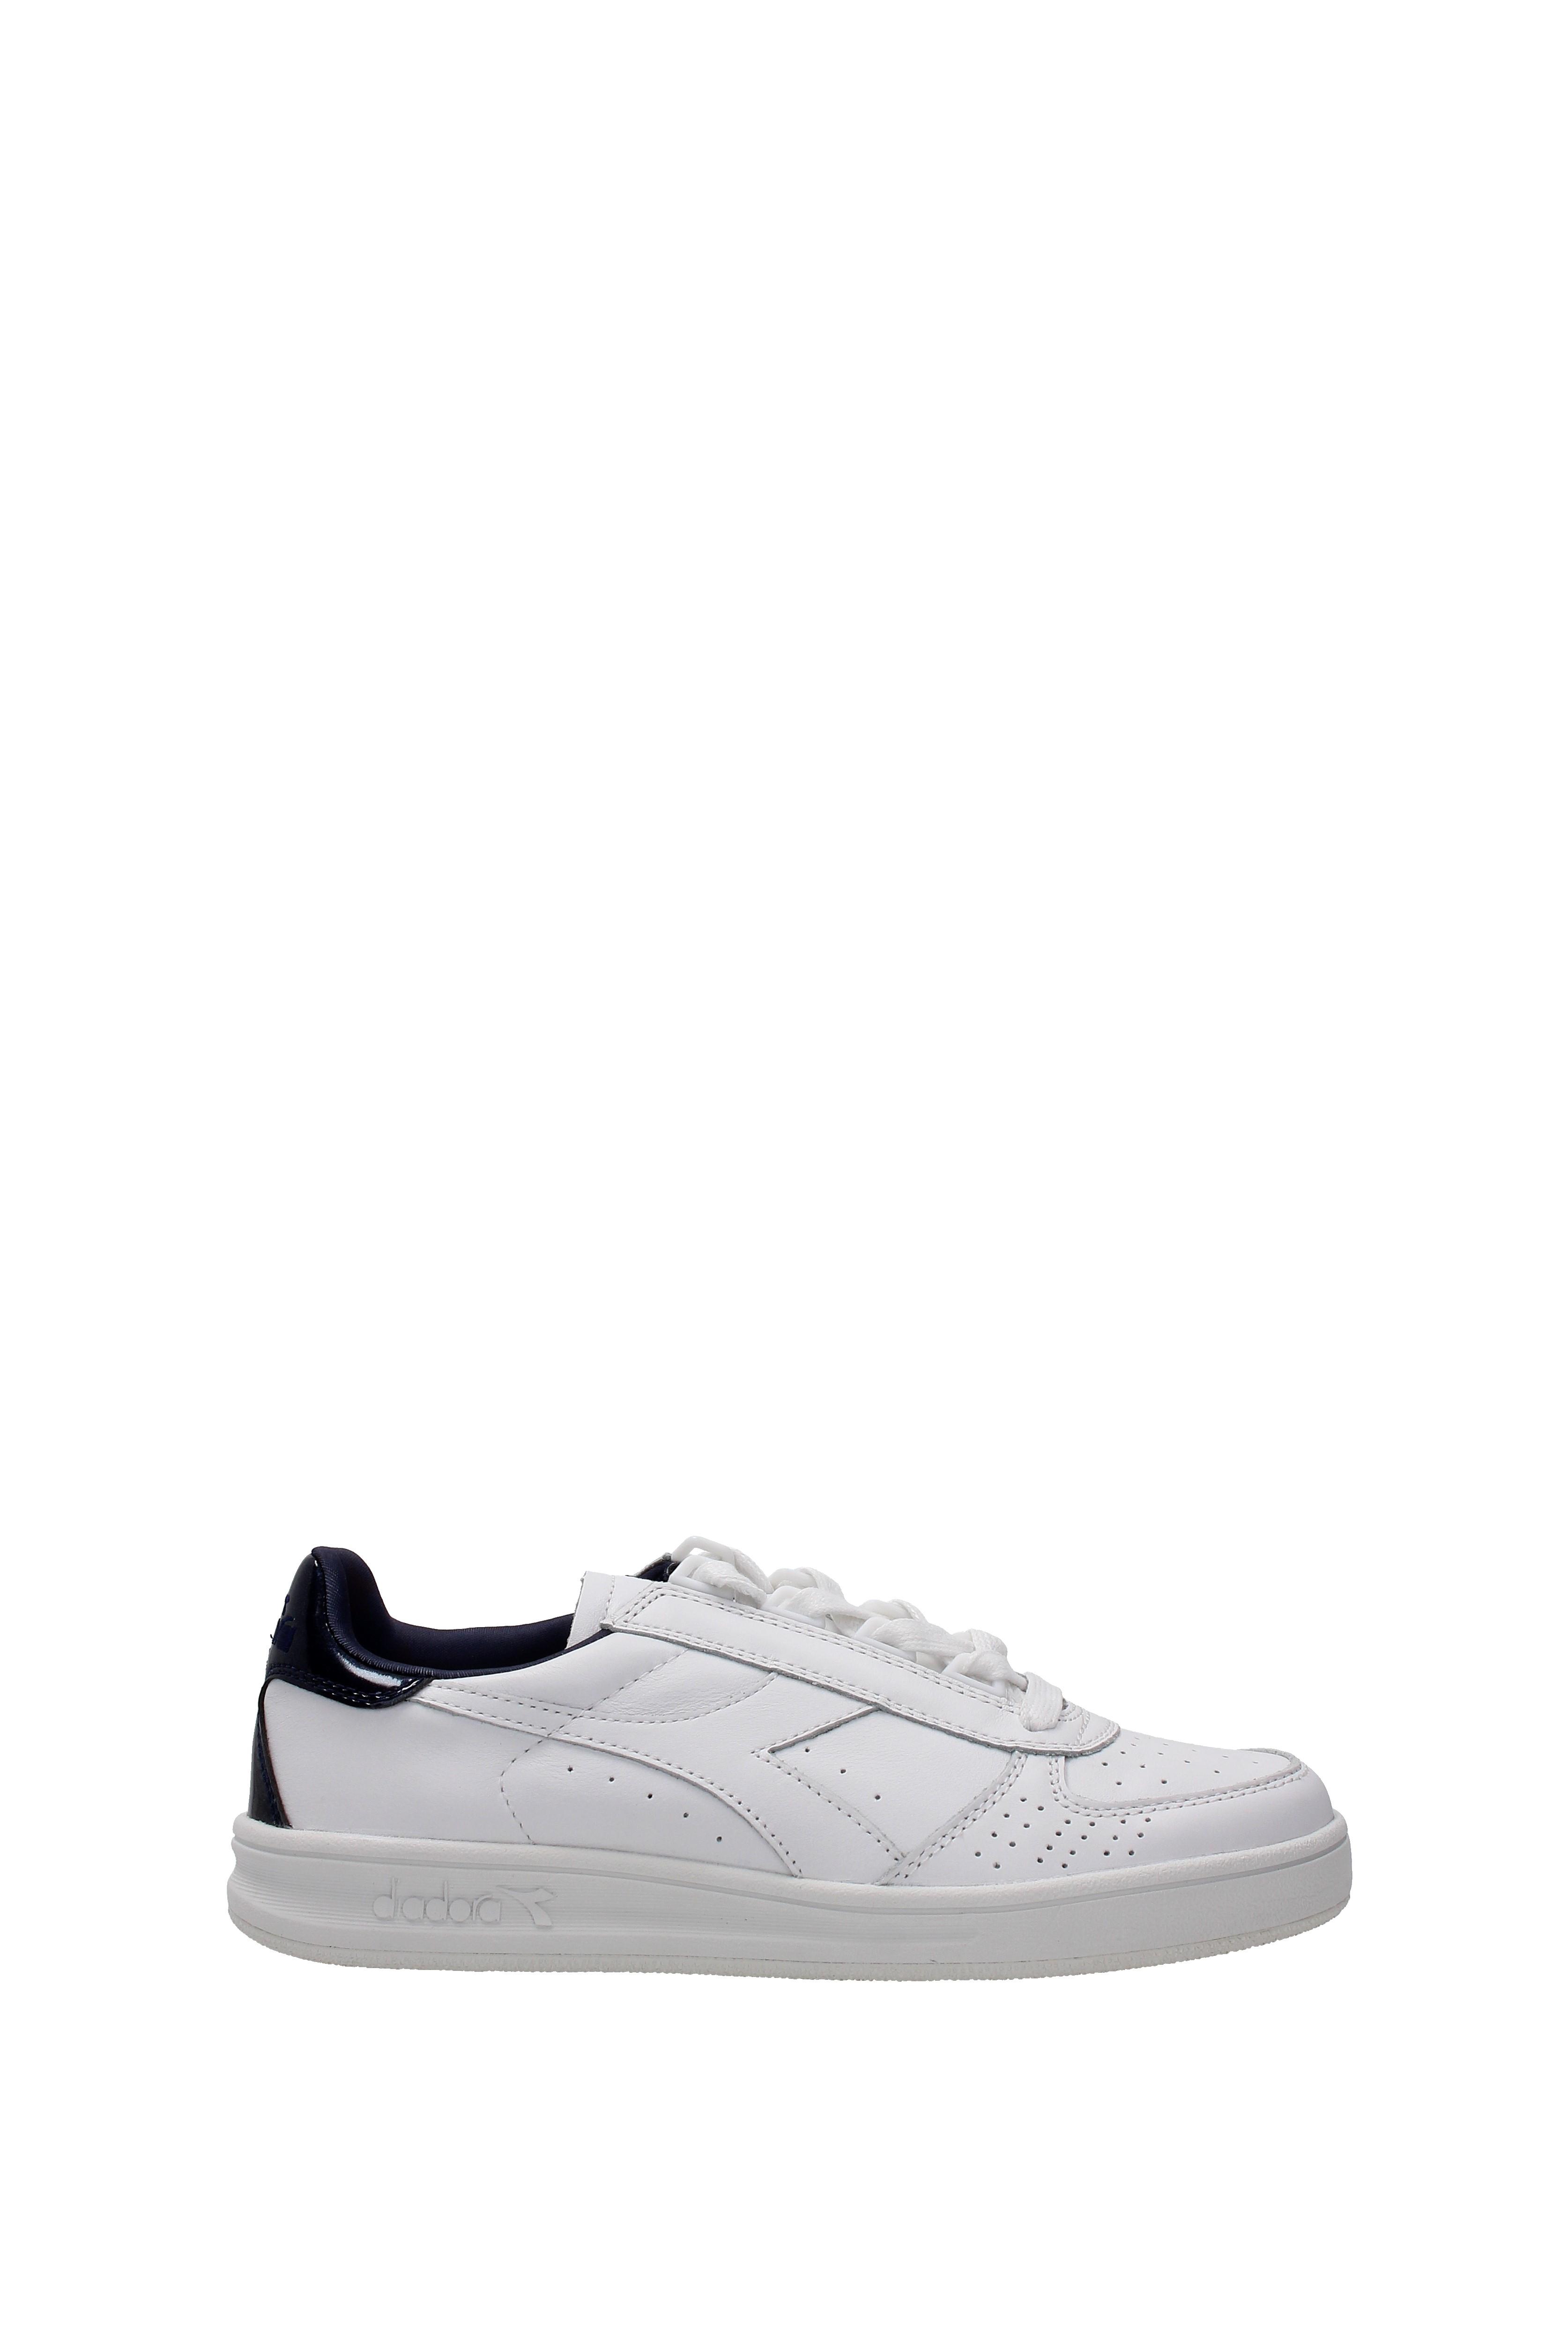 Sneakers Diadora Heritage Uomo Pelle U20117064901